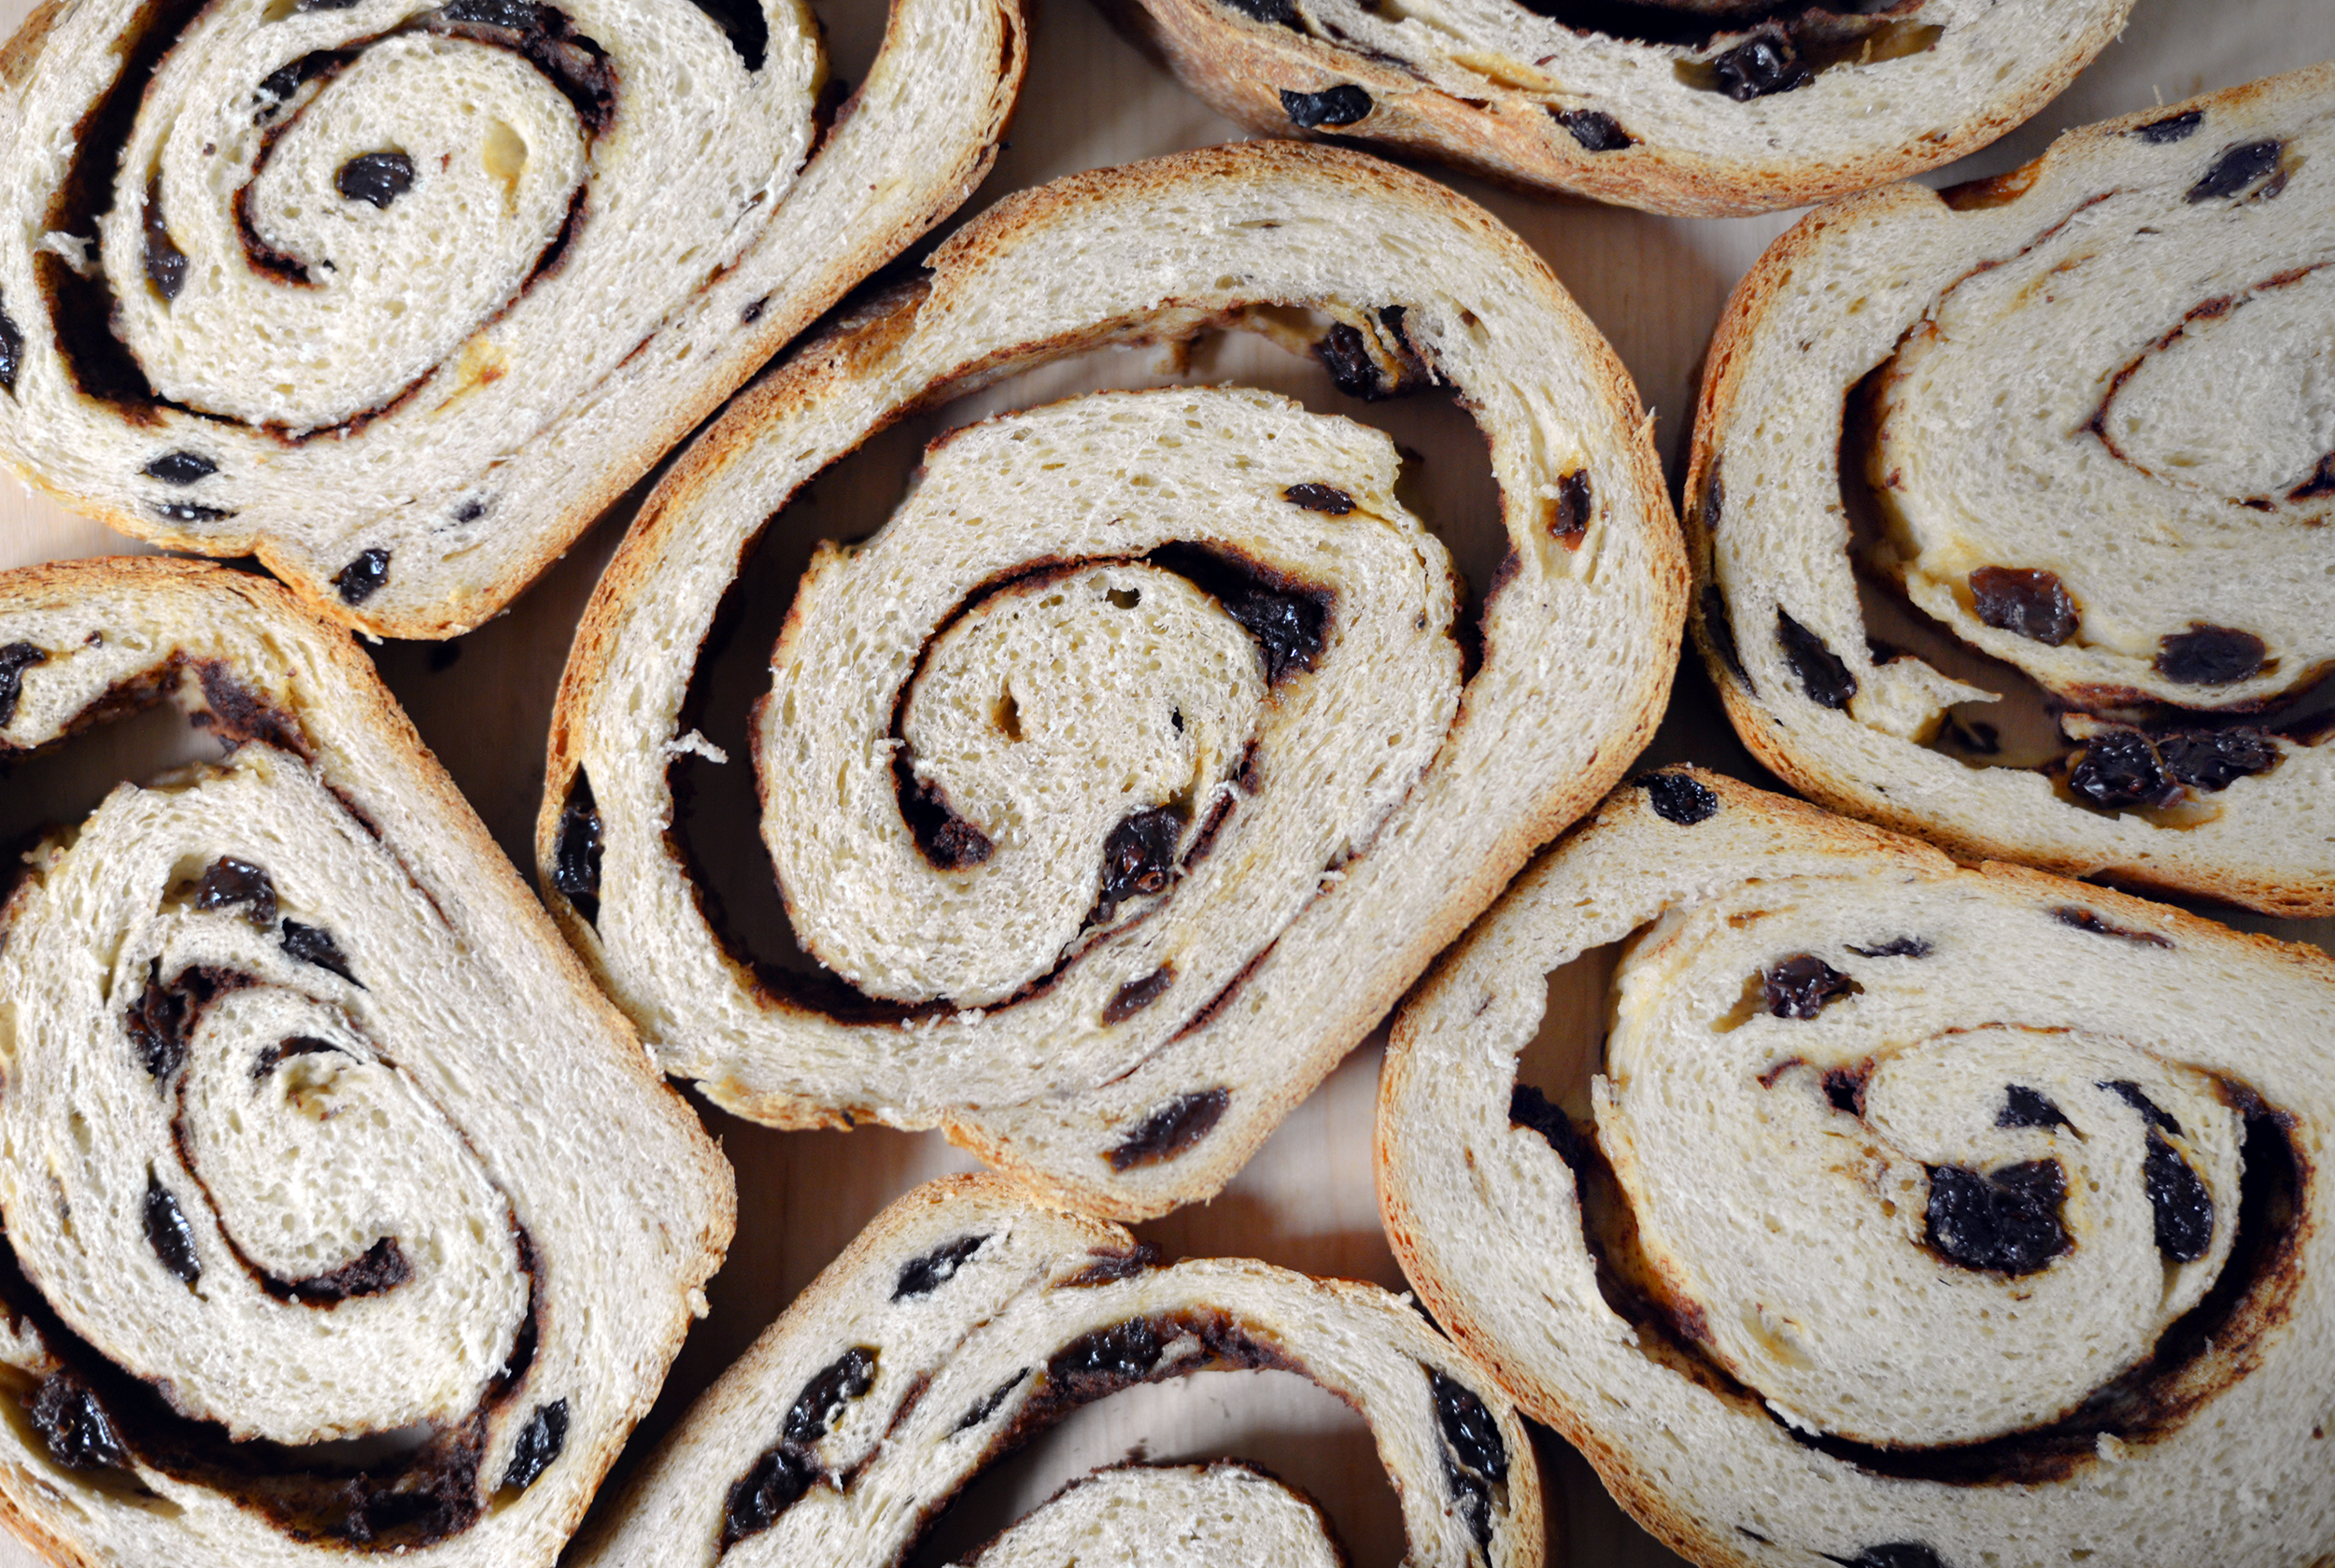 Cinnamon Raisin Bread - Global Dish - Stephanie Arsenault